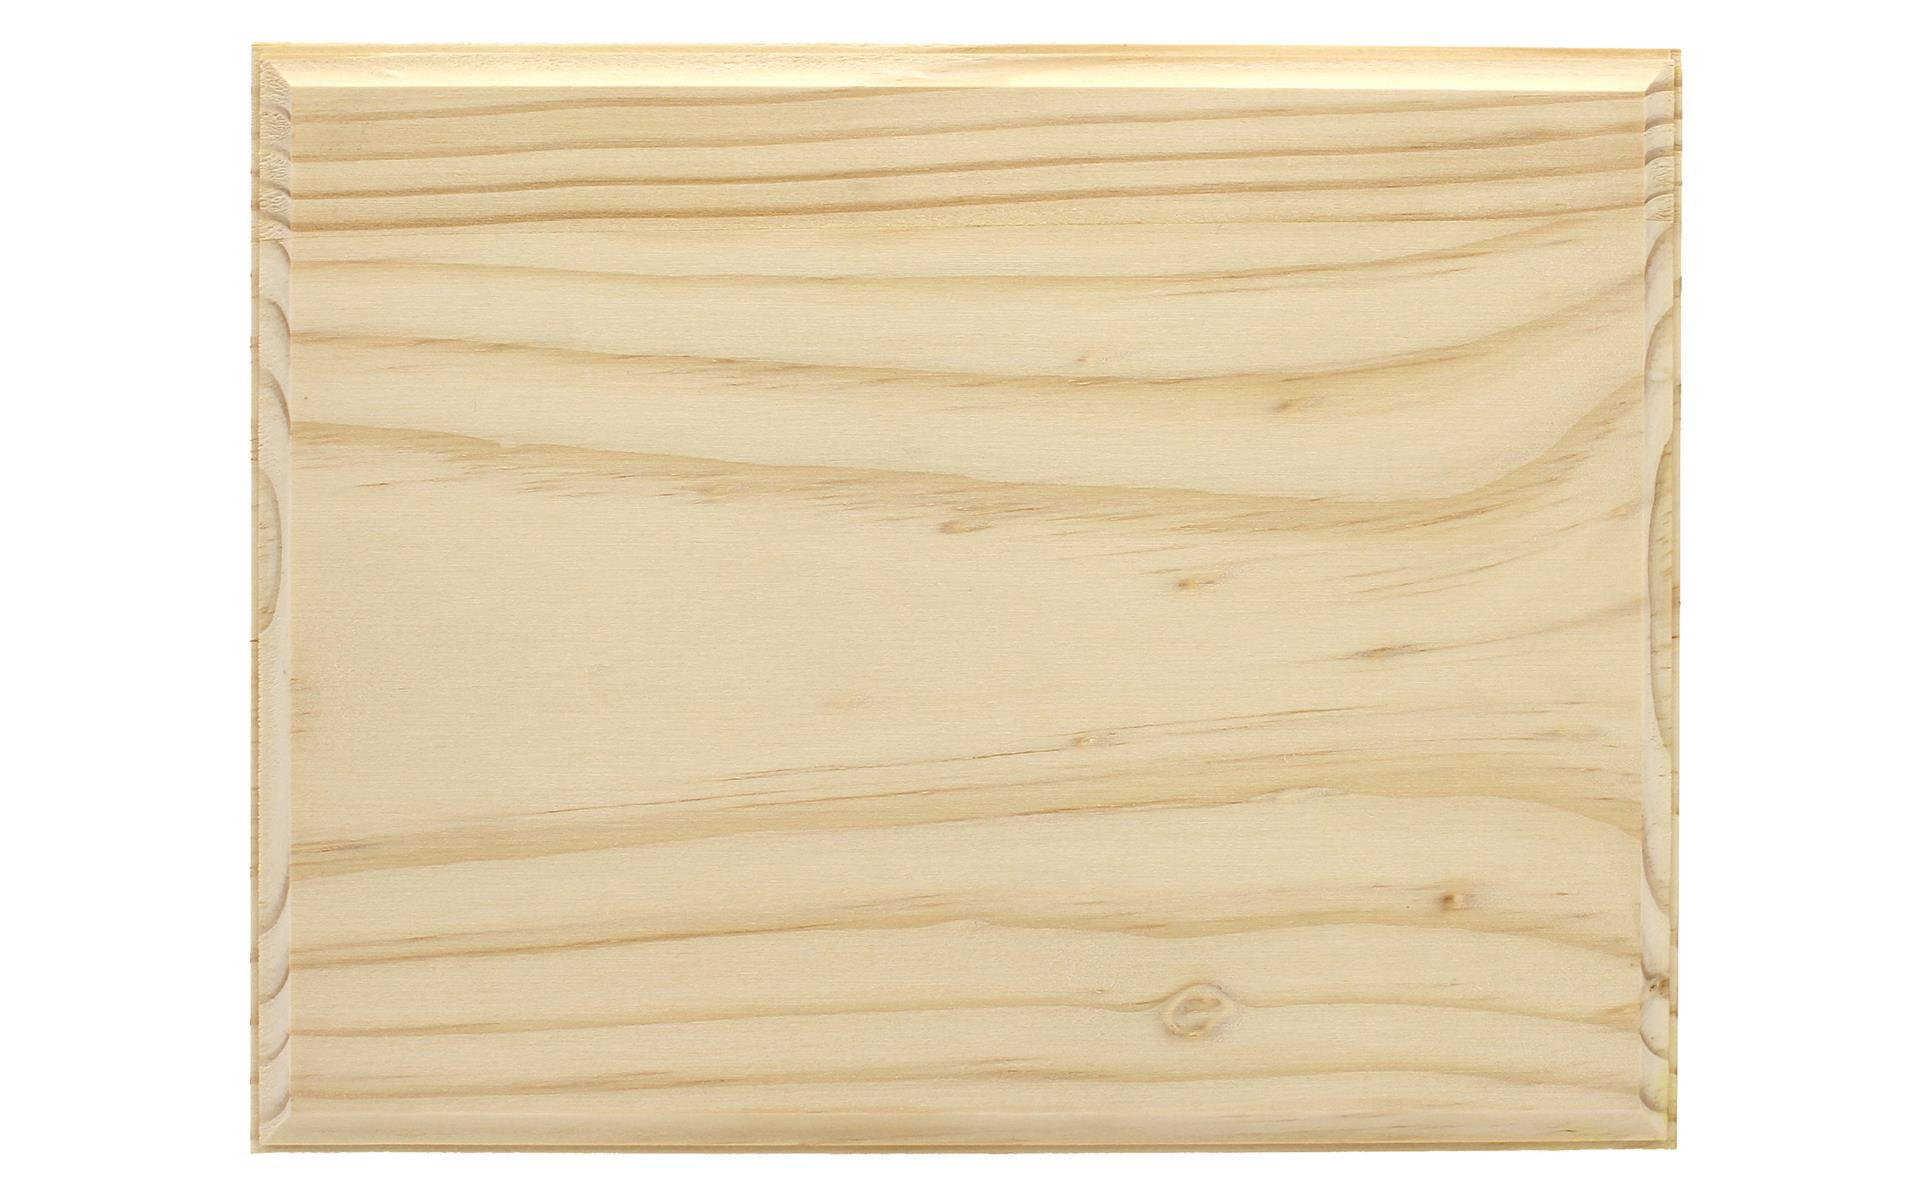 Darice Bulk Buy DIY Wood Plaque Arrow 13.75 x 3.75 inches 6-Pack 9184-09